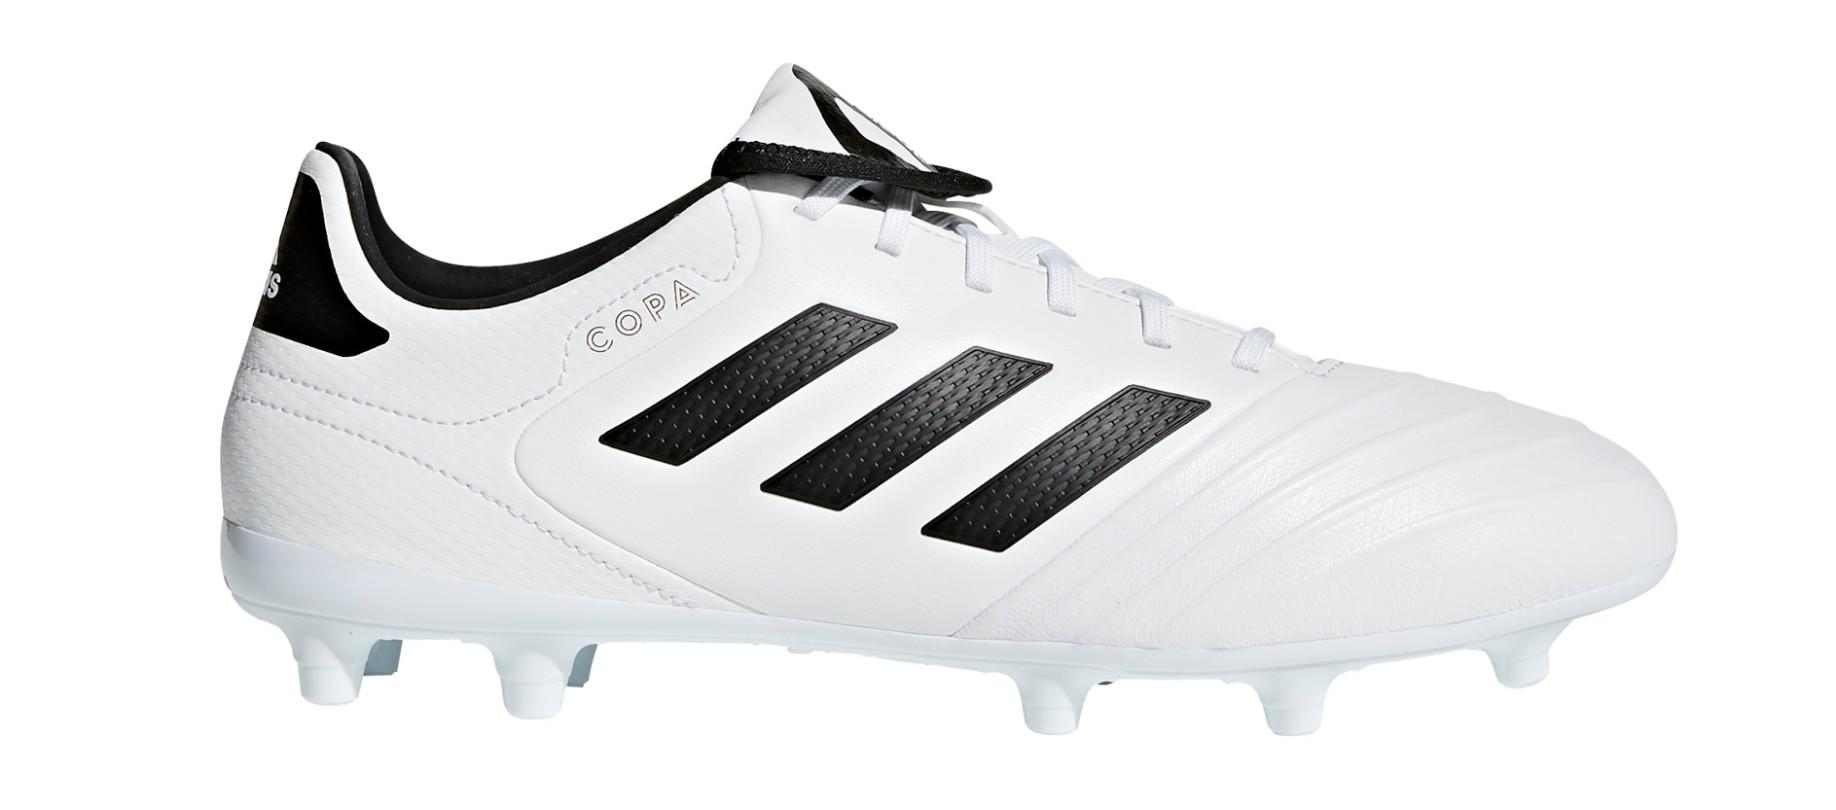 brand new b80d0 41bbc Football boots Adidas Copa 18.3 FG Skystalker Pack colore White - Adidas -  SportIT.com